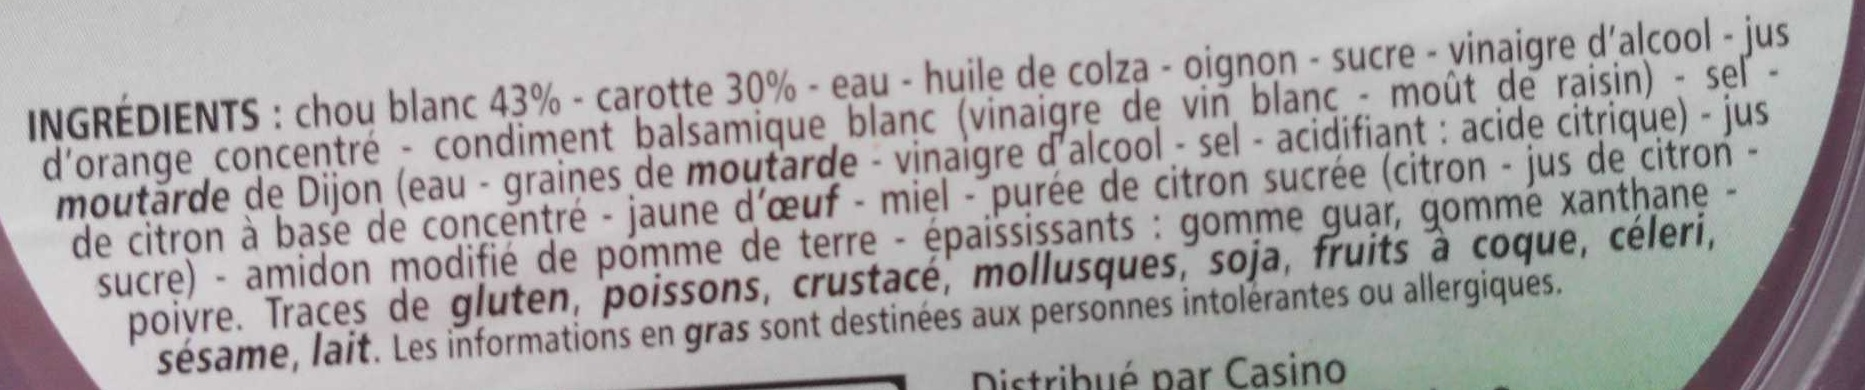 Coleslaw - Ingrediënten